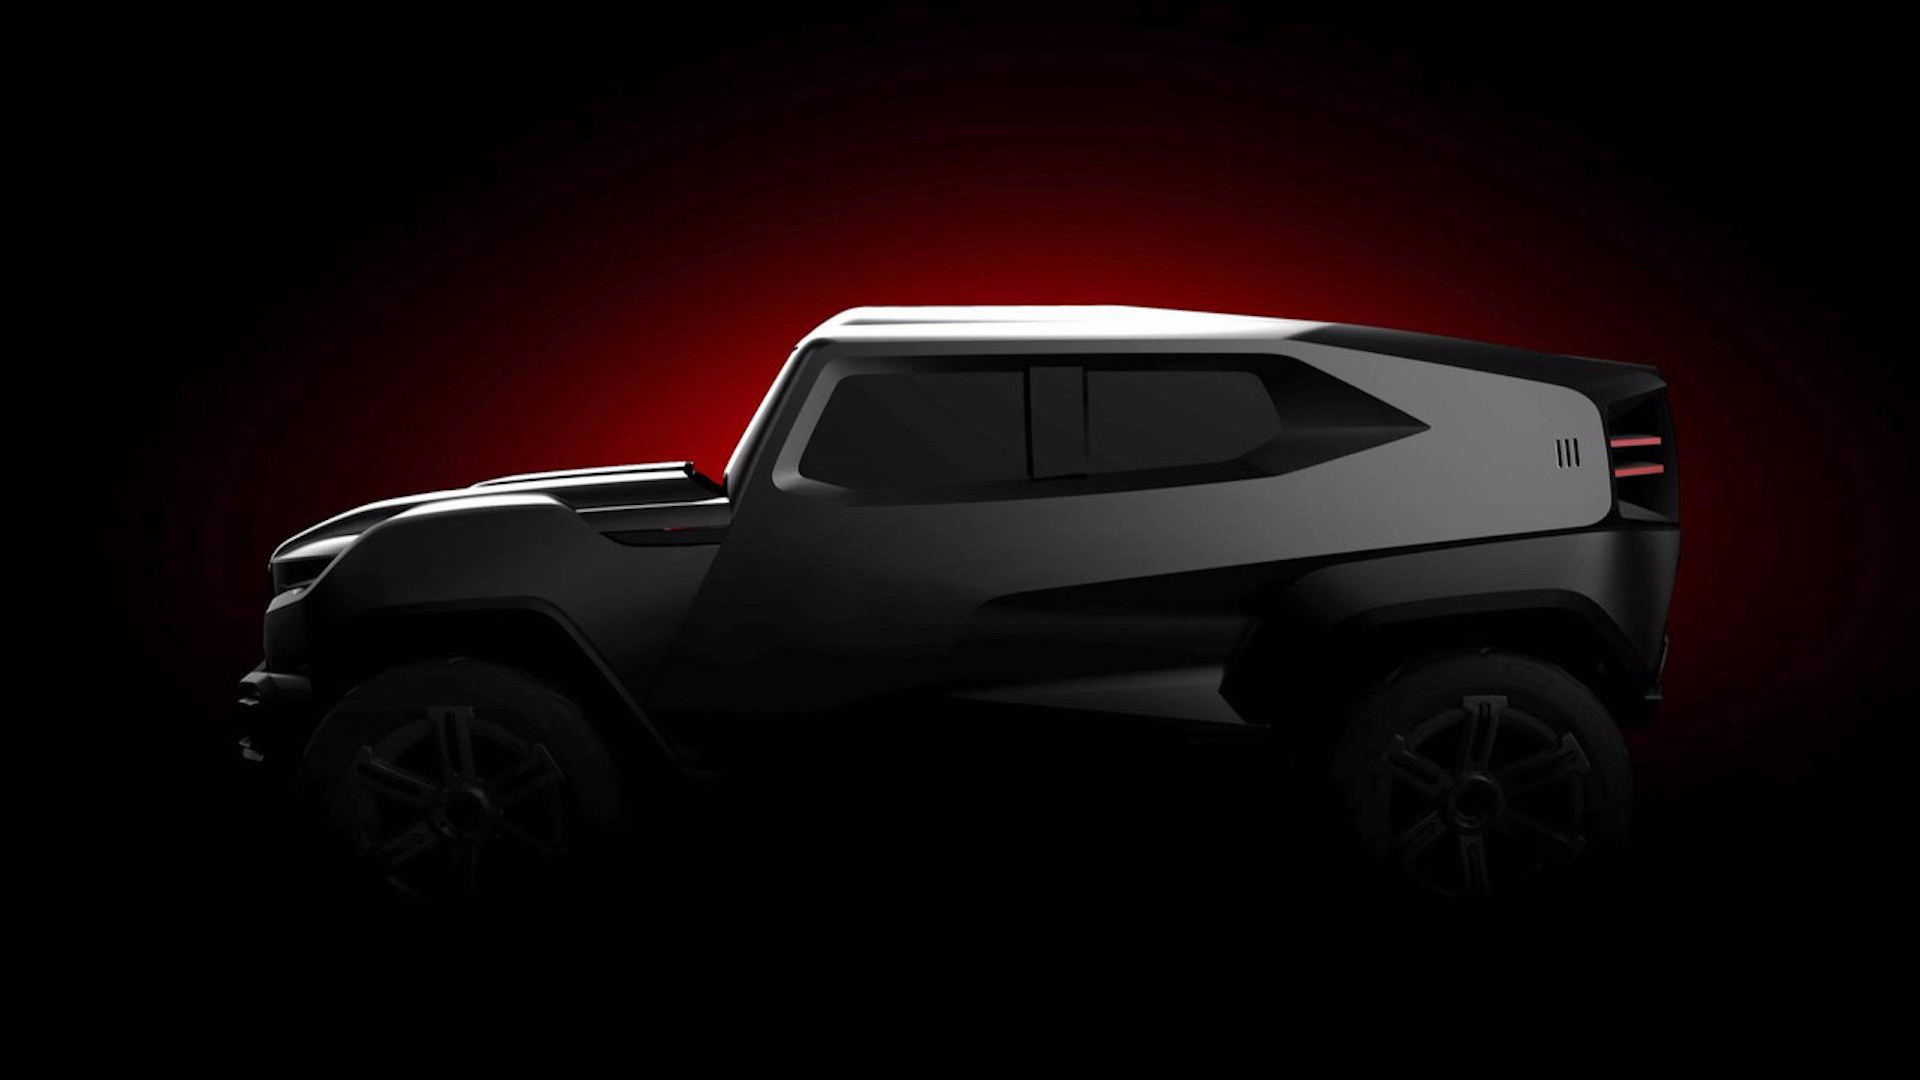 Sports car startup Rezvani teases tough military-inspired SUV